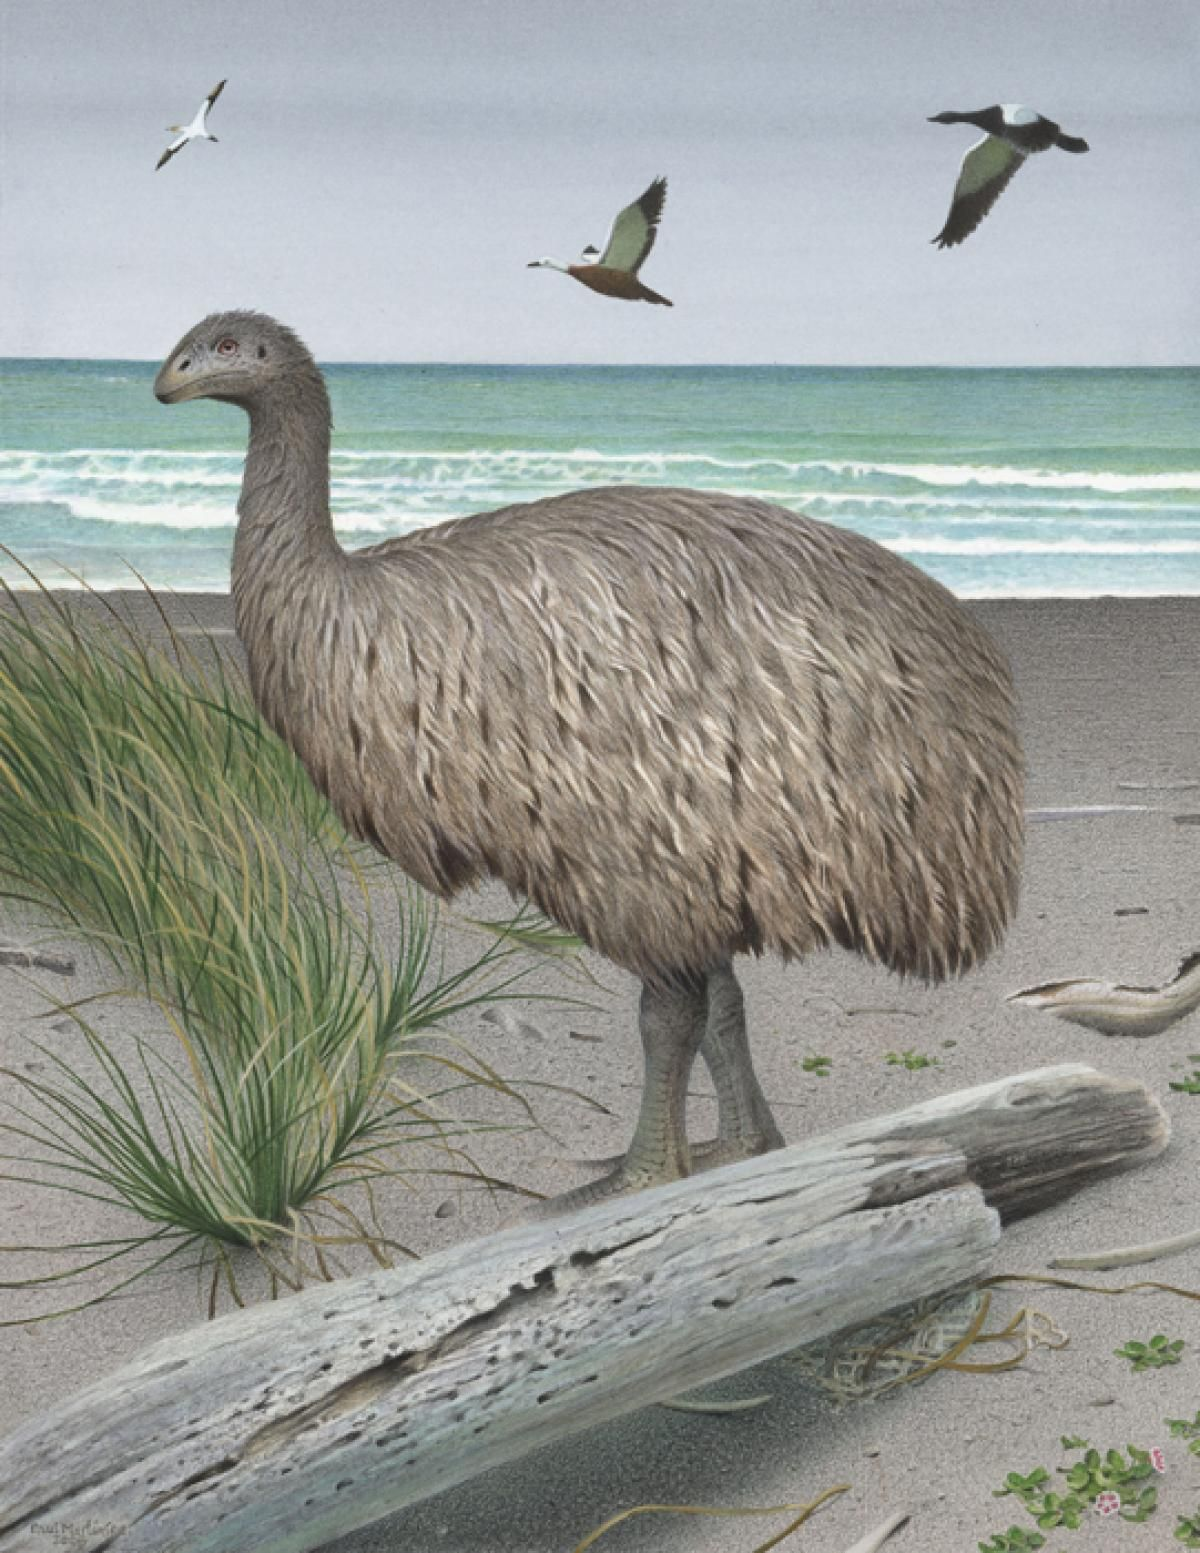 Euryapteryx Curtus Or The Coastal Moa By Paul Martinson